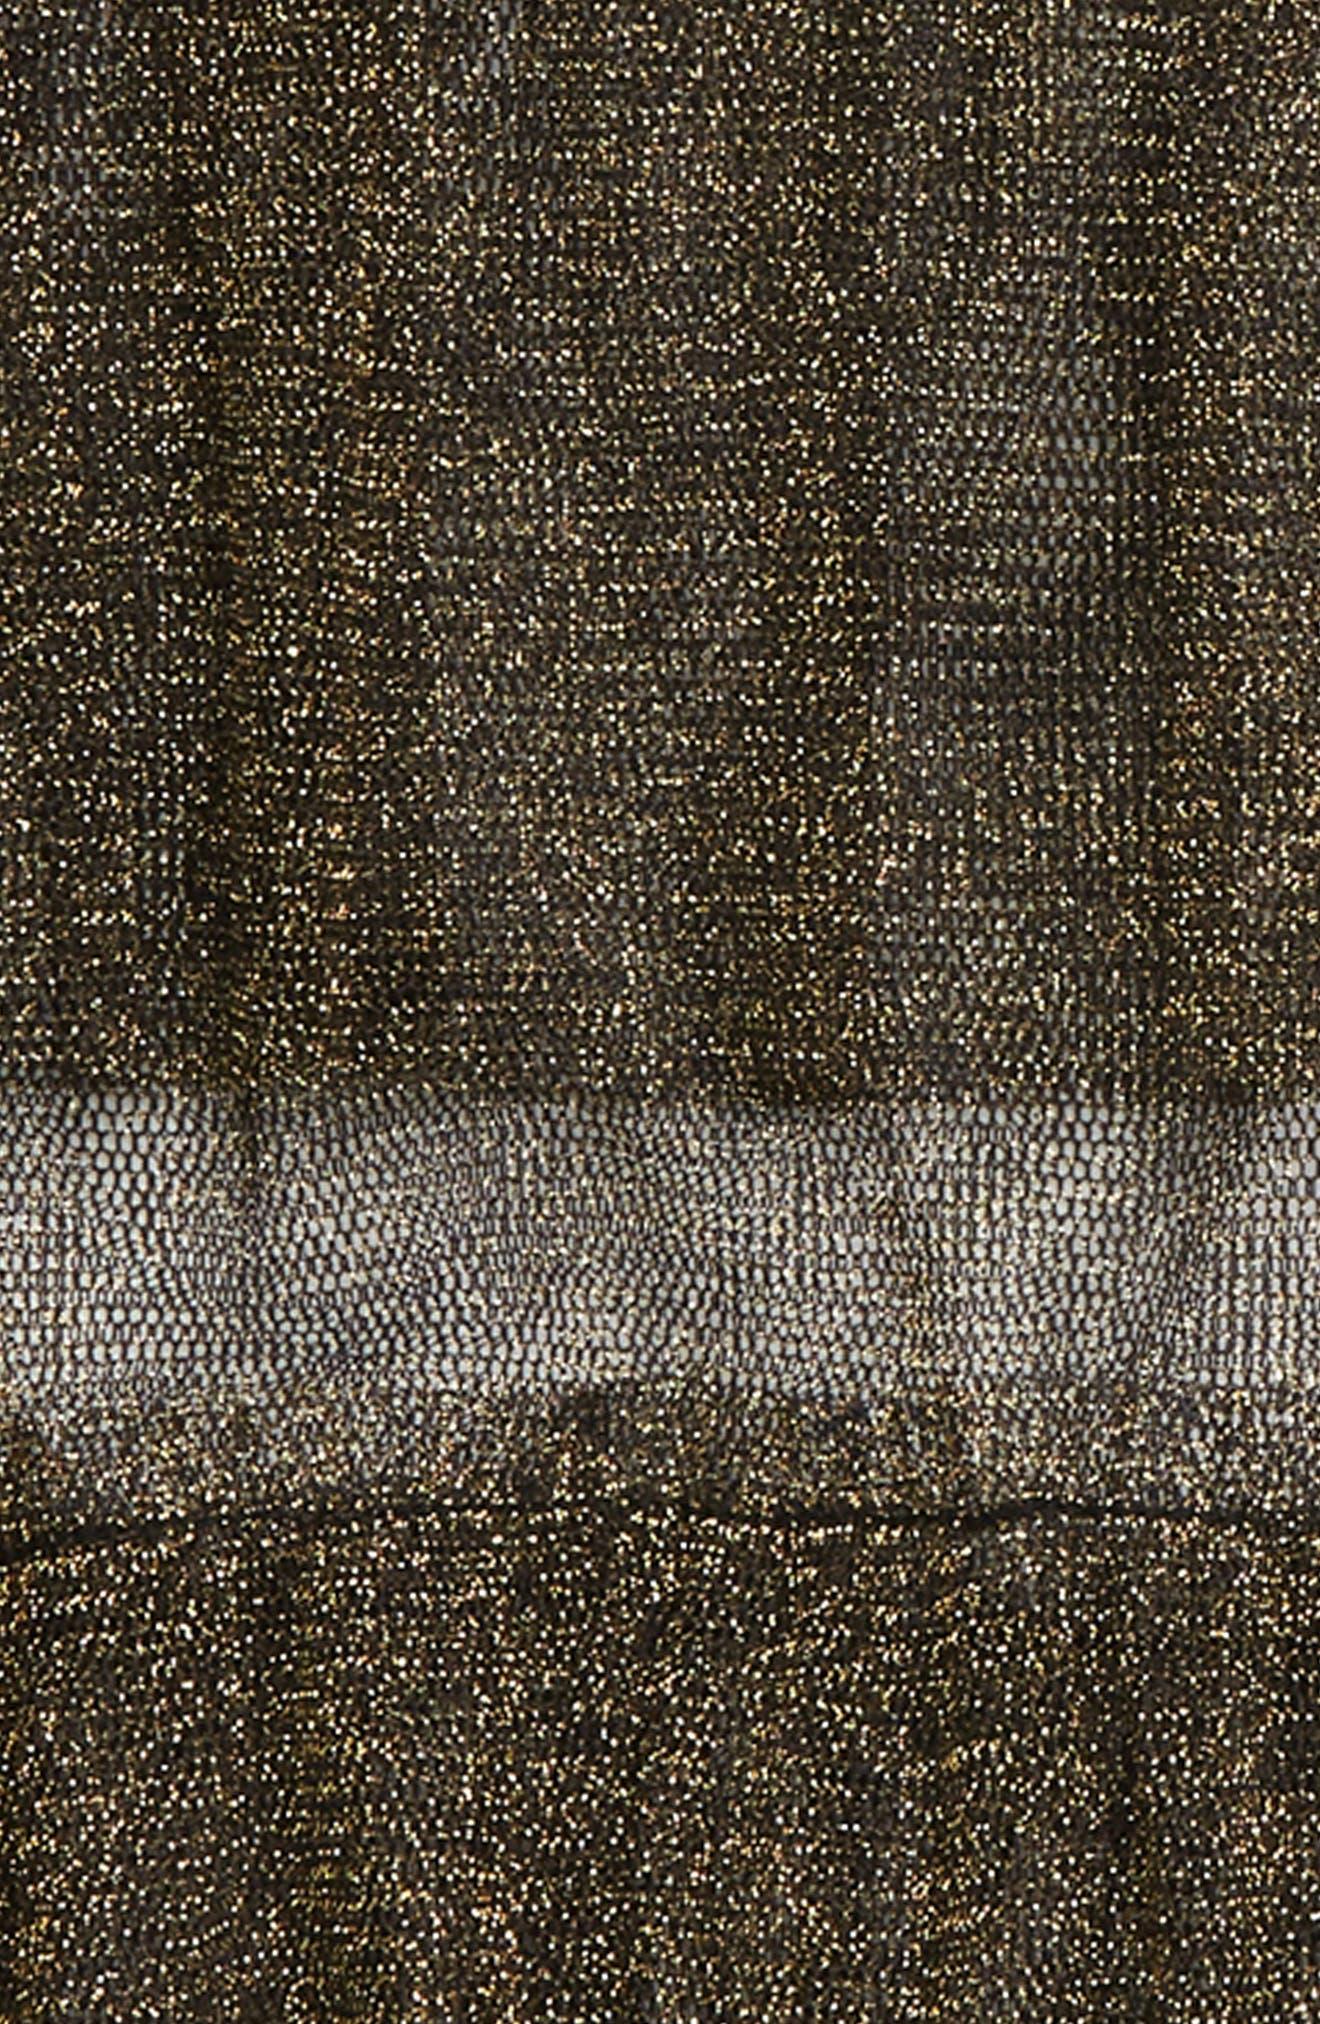 Sheer Sparkle Tulle Top,                             Alternate thumbnail 2, color,                             BLACK